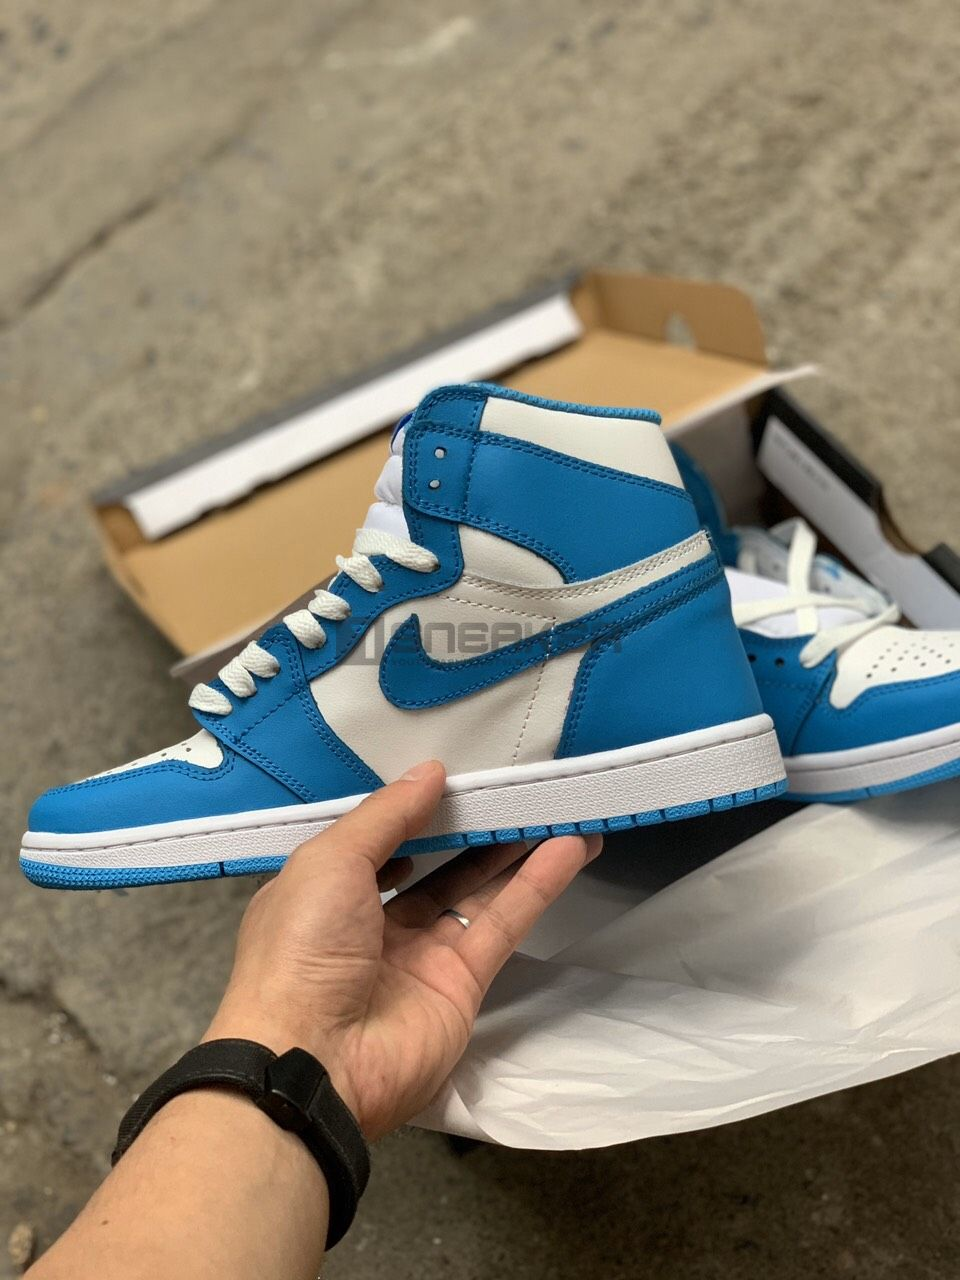 Nike Air Jordan 1 Retro High UNC